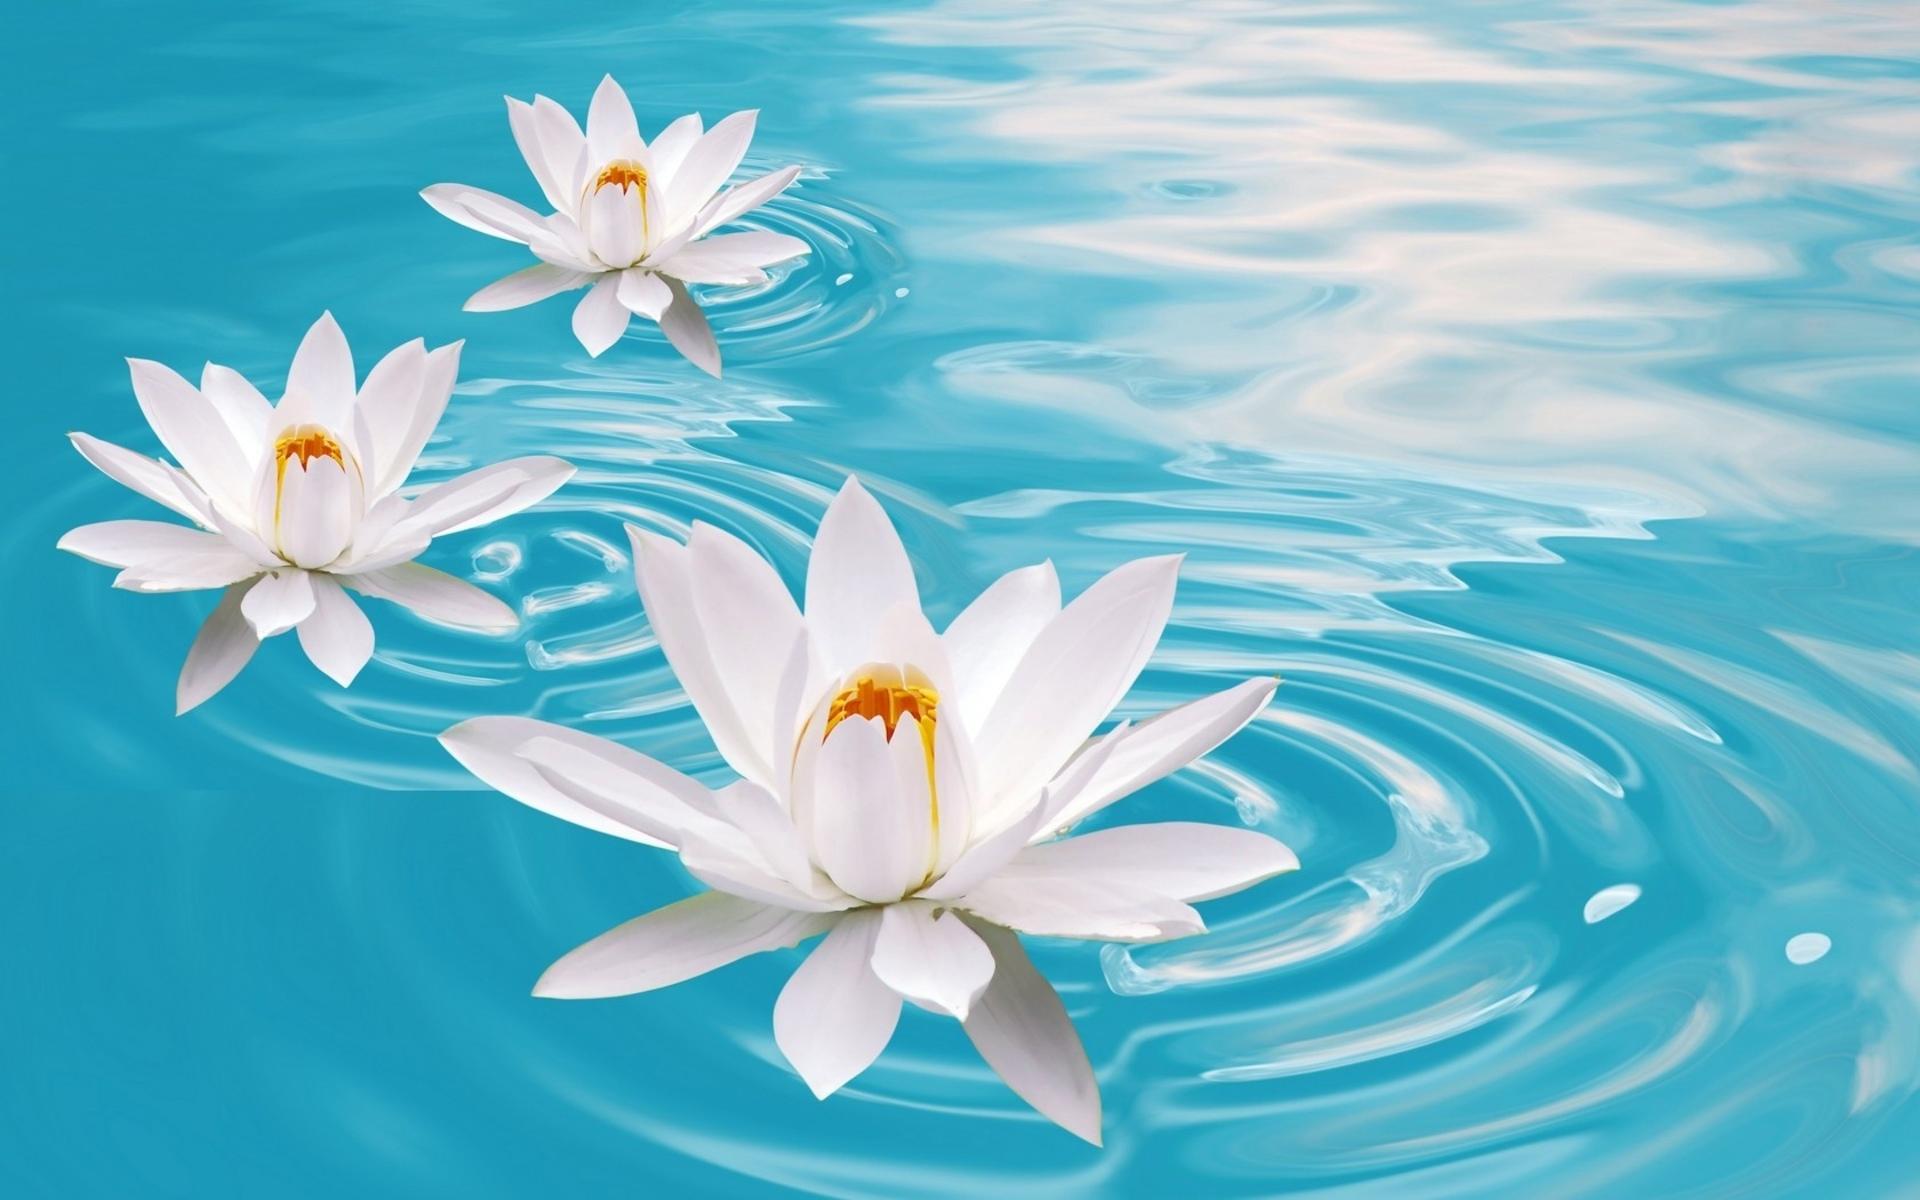 Bokeh mood zen flowers water relax wallpaper 1920x1200 29609 1920x1200